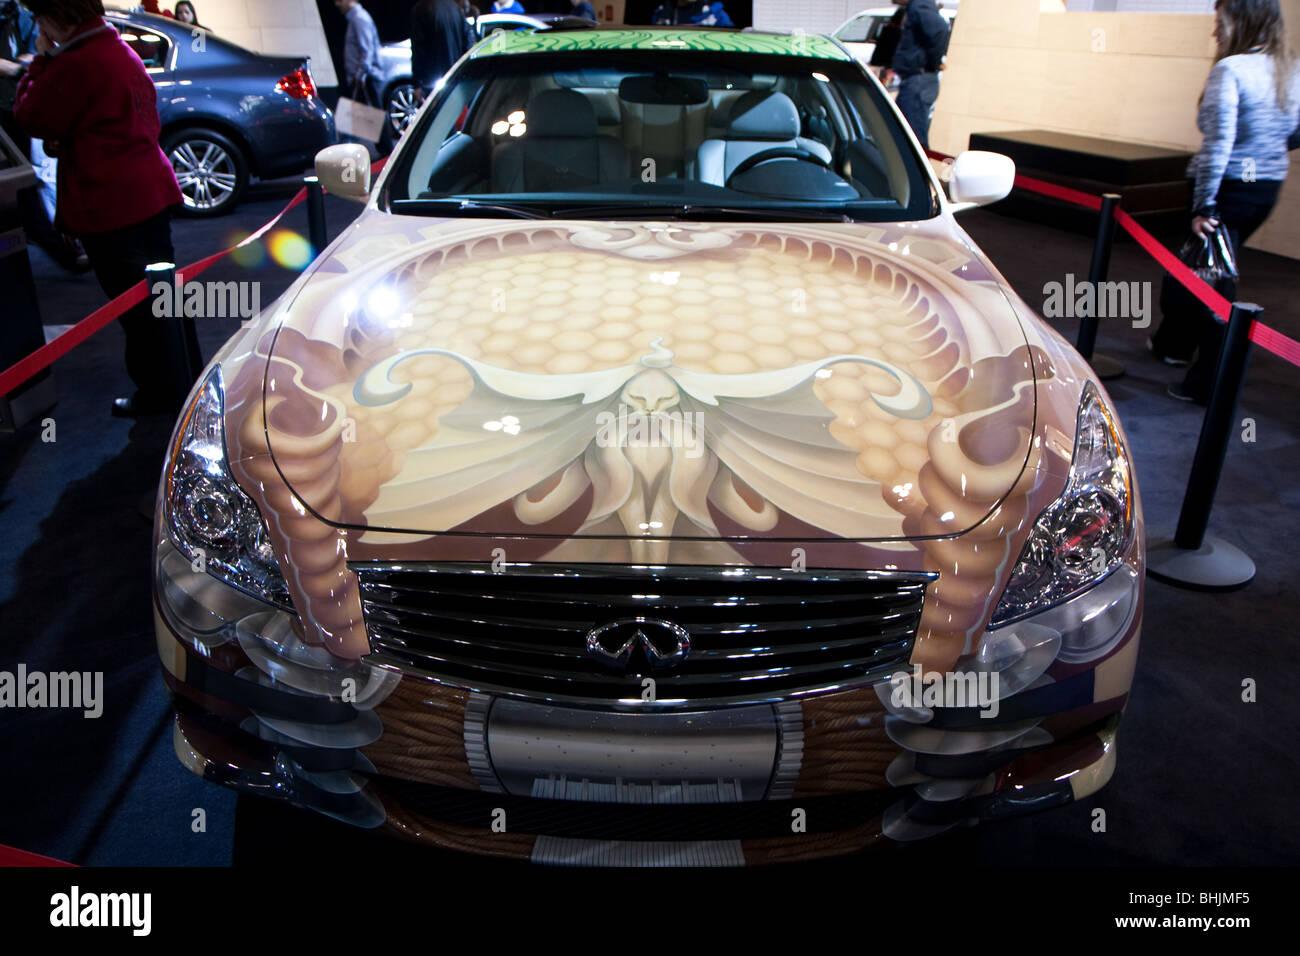 Infiniti G35 Custom >> Infiniti G35 Custom Paint Job Stock Photo 28070761 Alamy